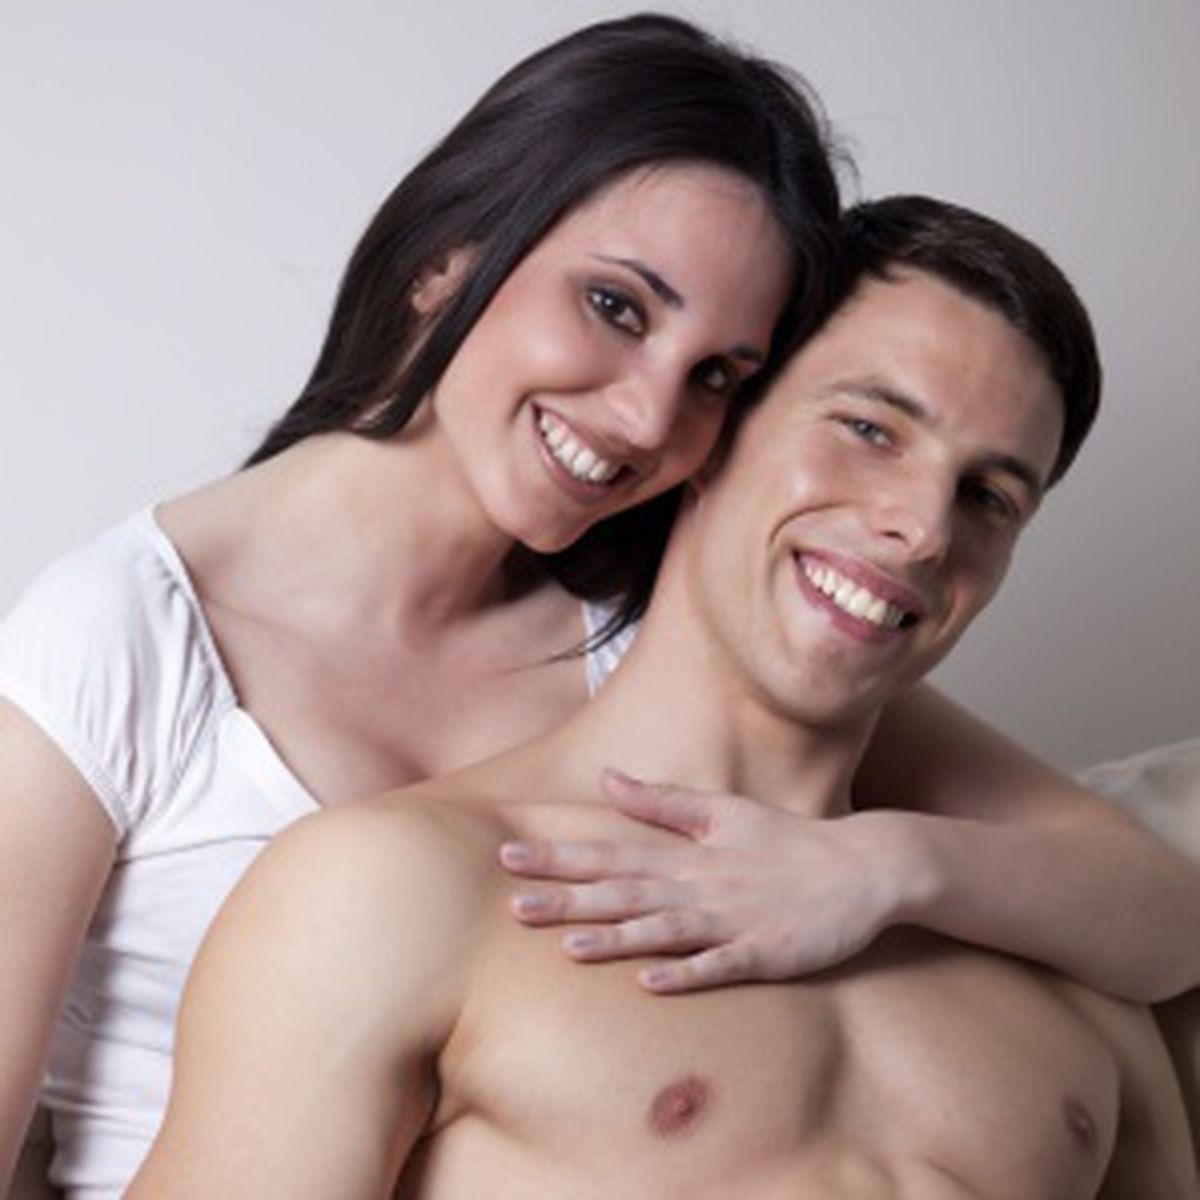 erecție și pasiune